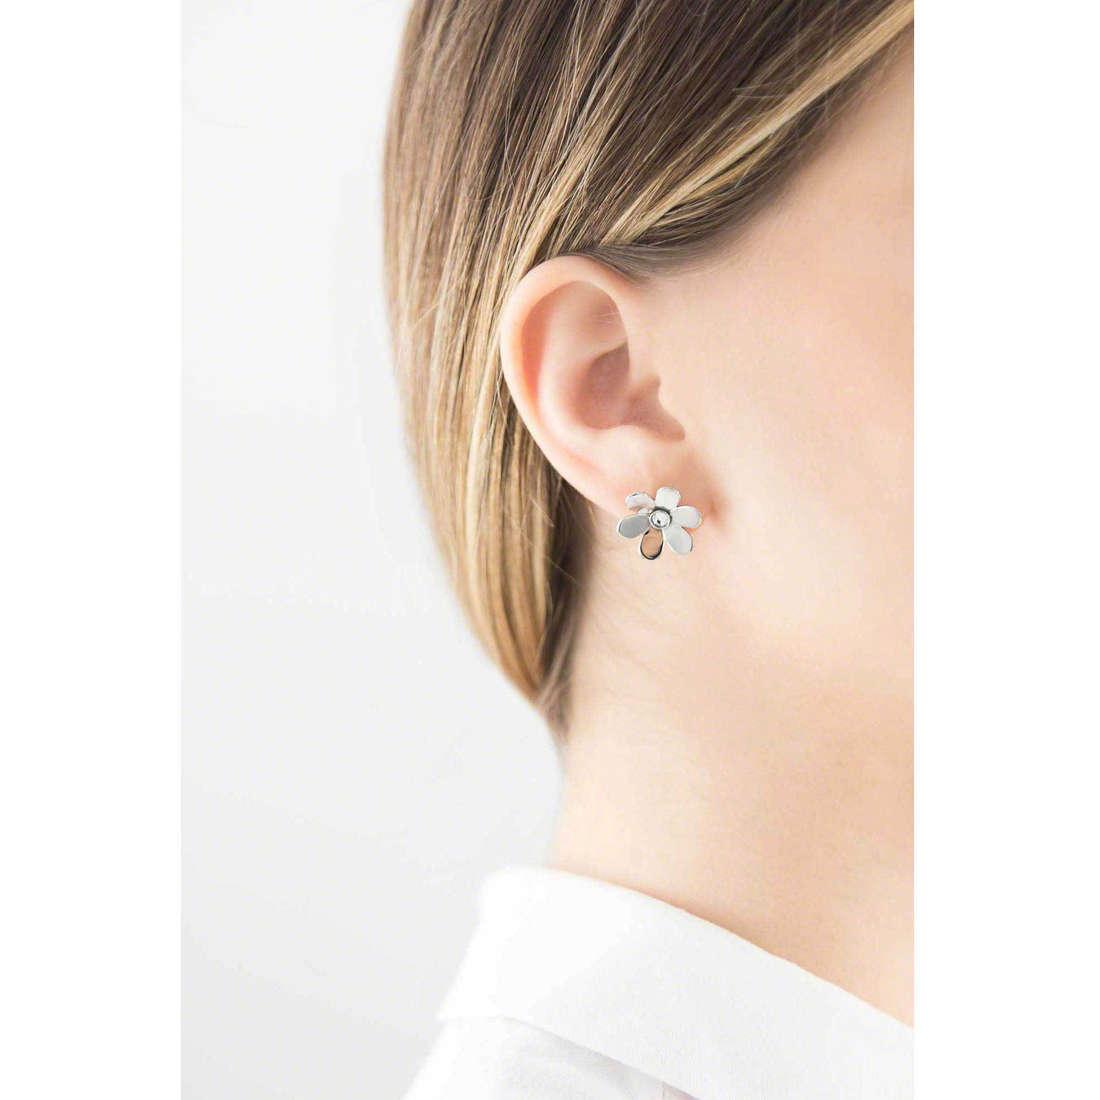 Brosway boucles d'oreille Jardin femme BJR22 indosso